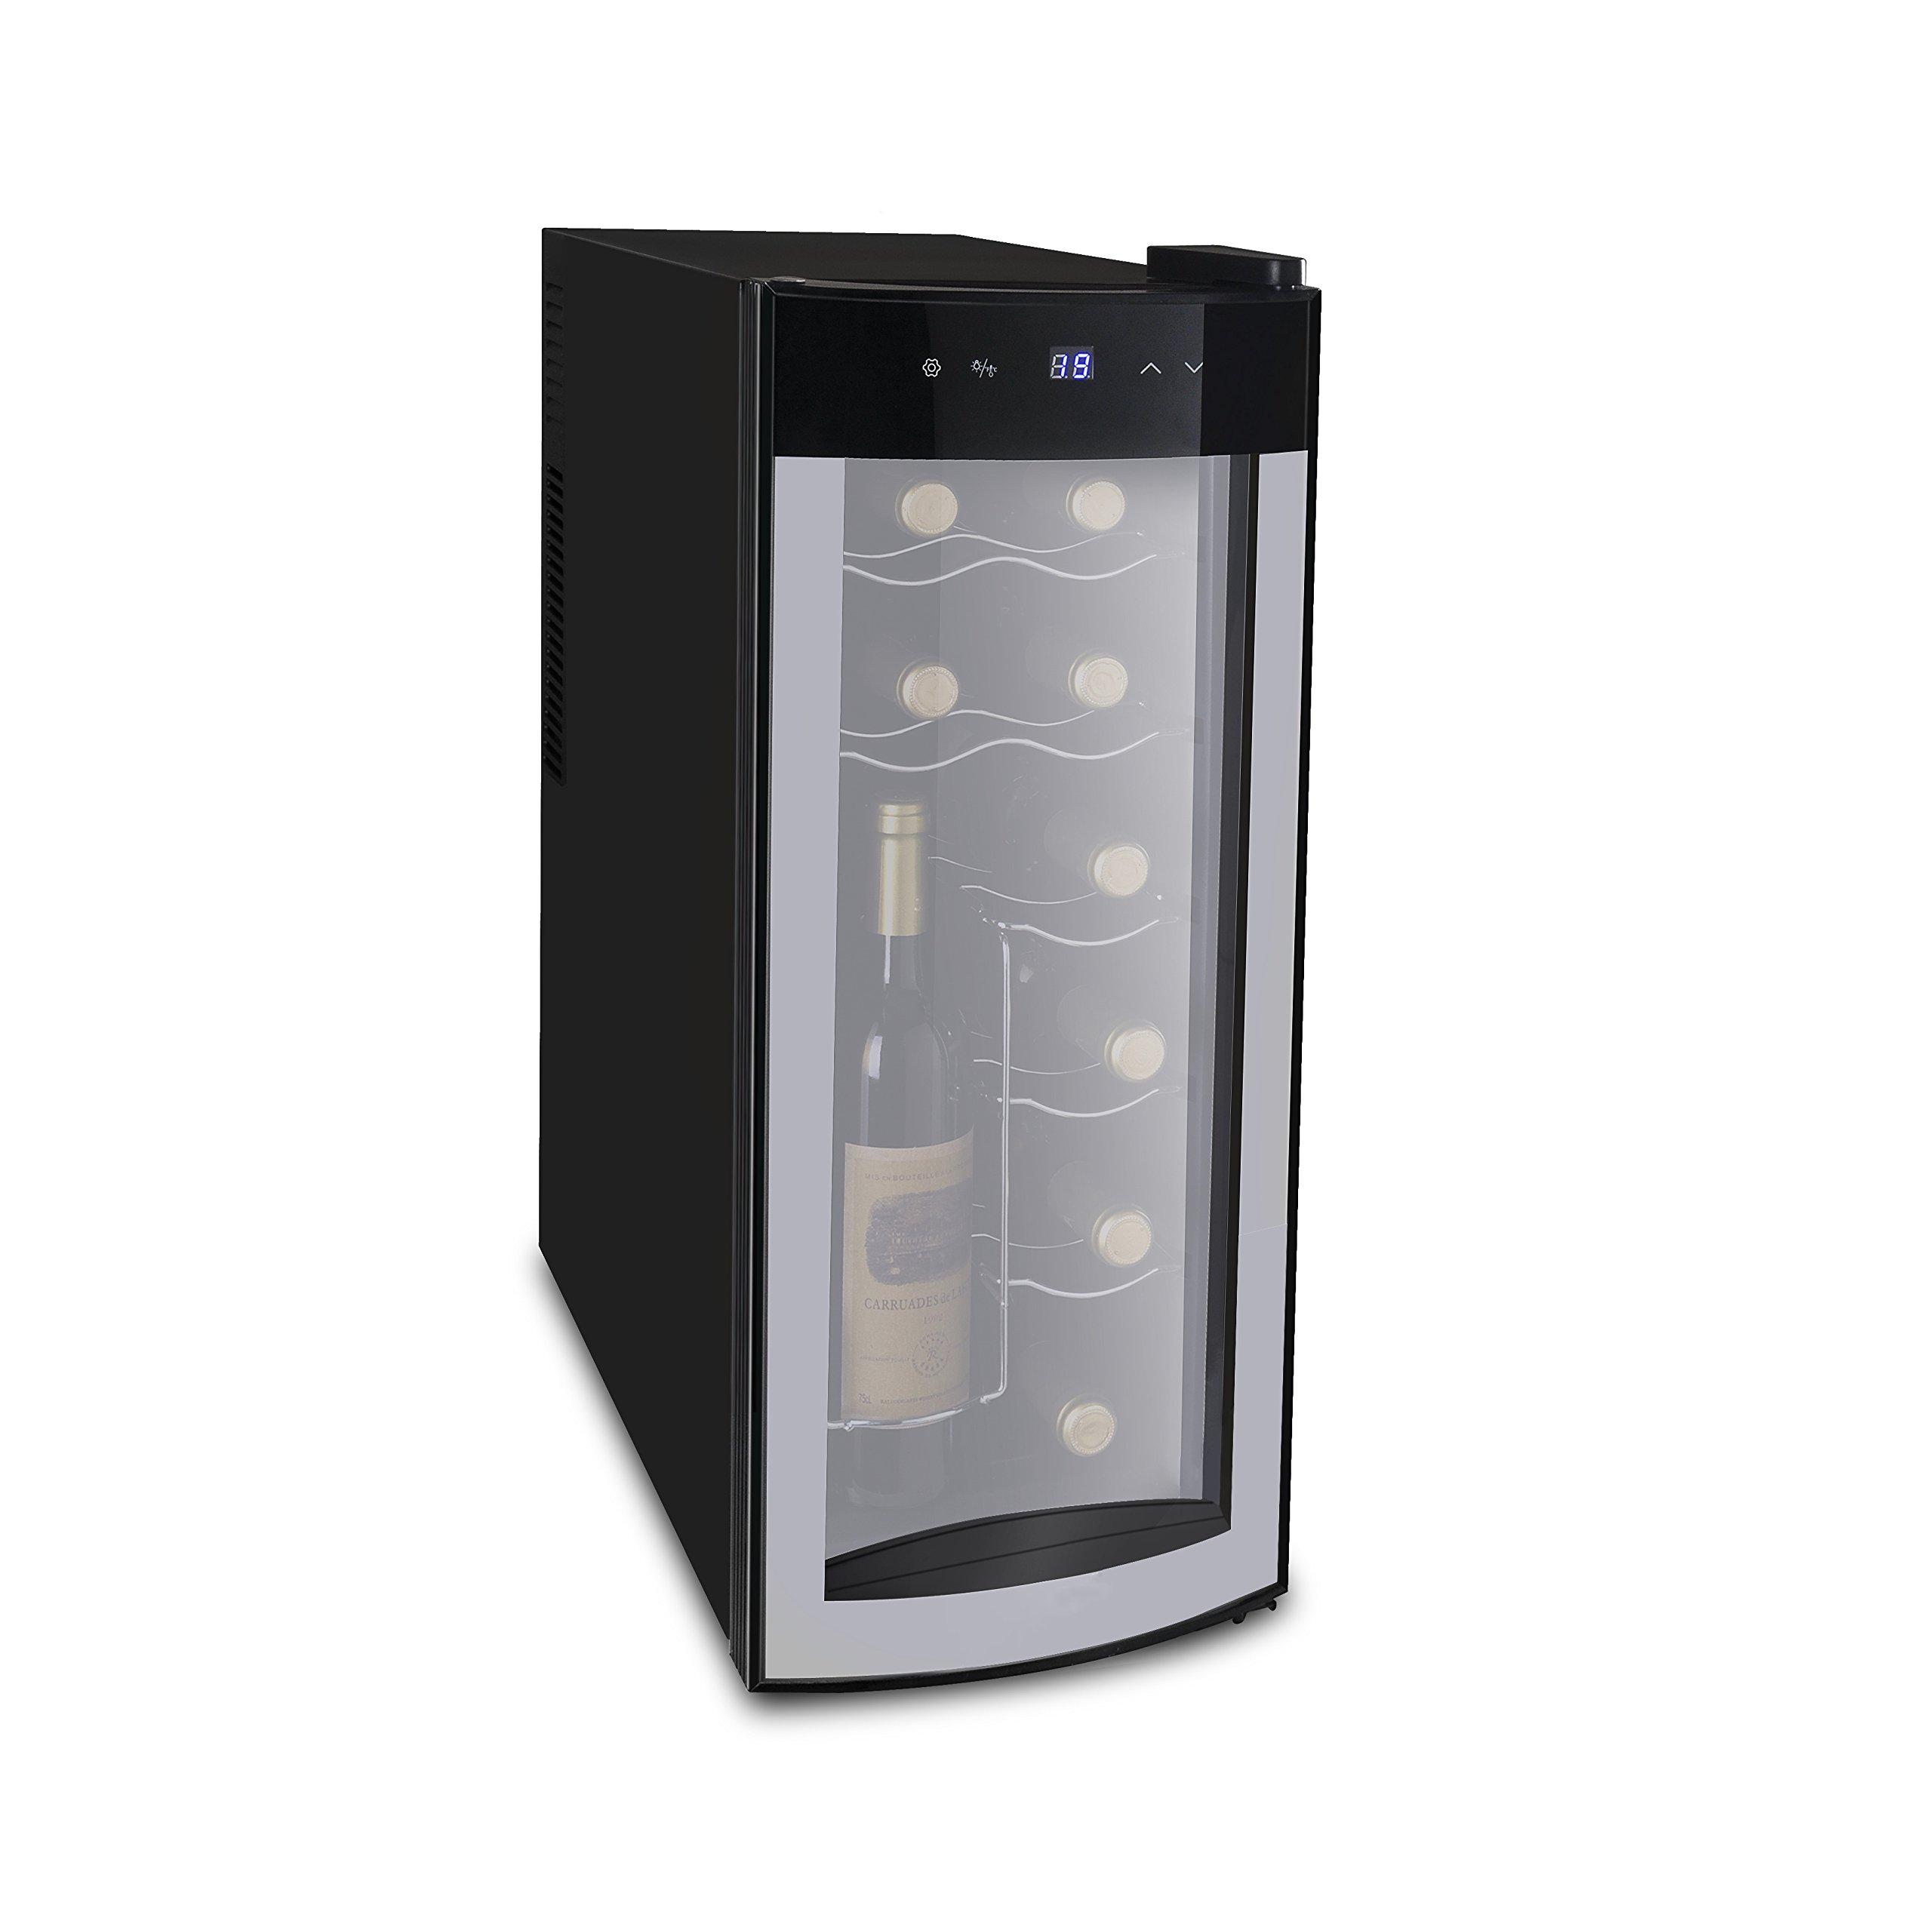 Frigidaire FRW1225 Wine Cooler, Black by FRIGIDAIRE